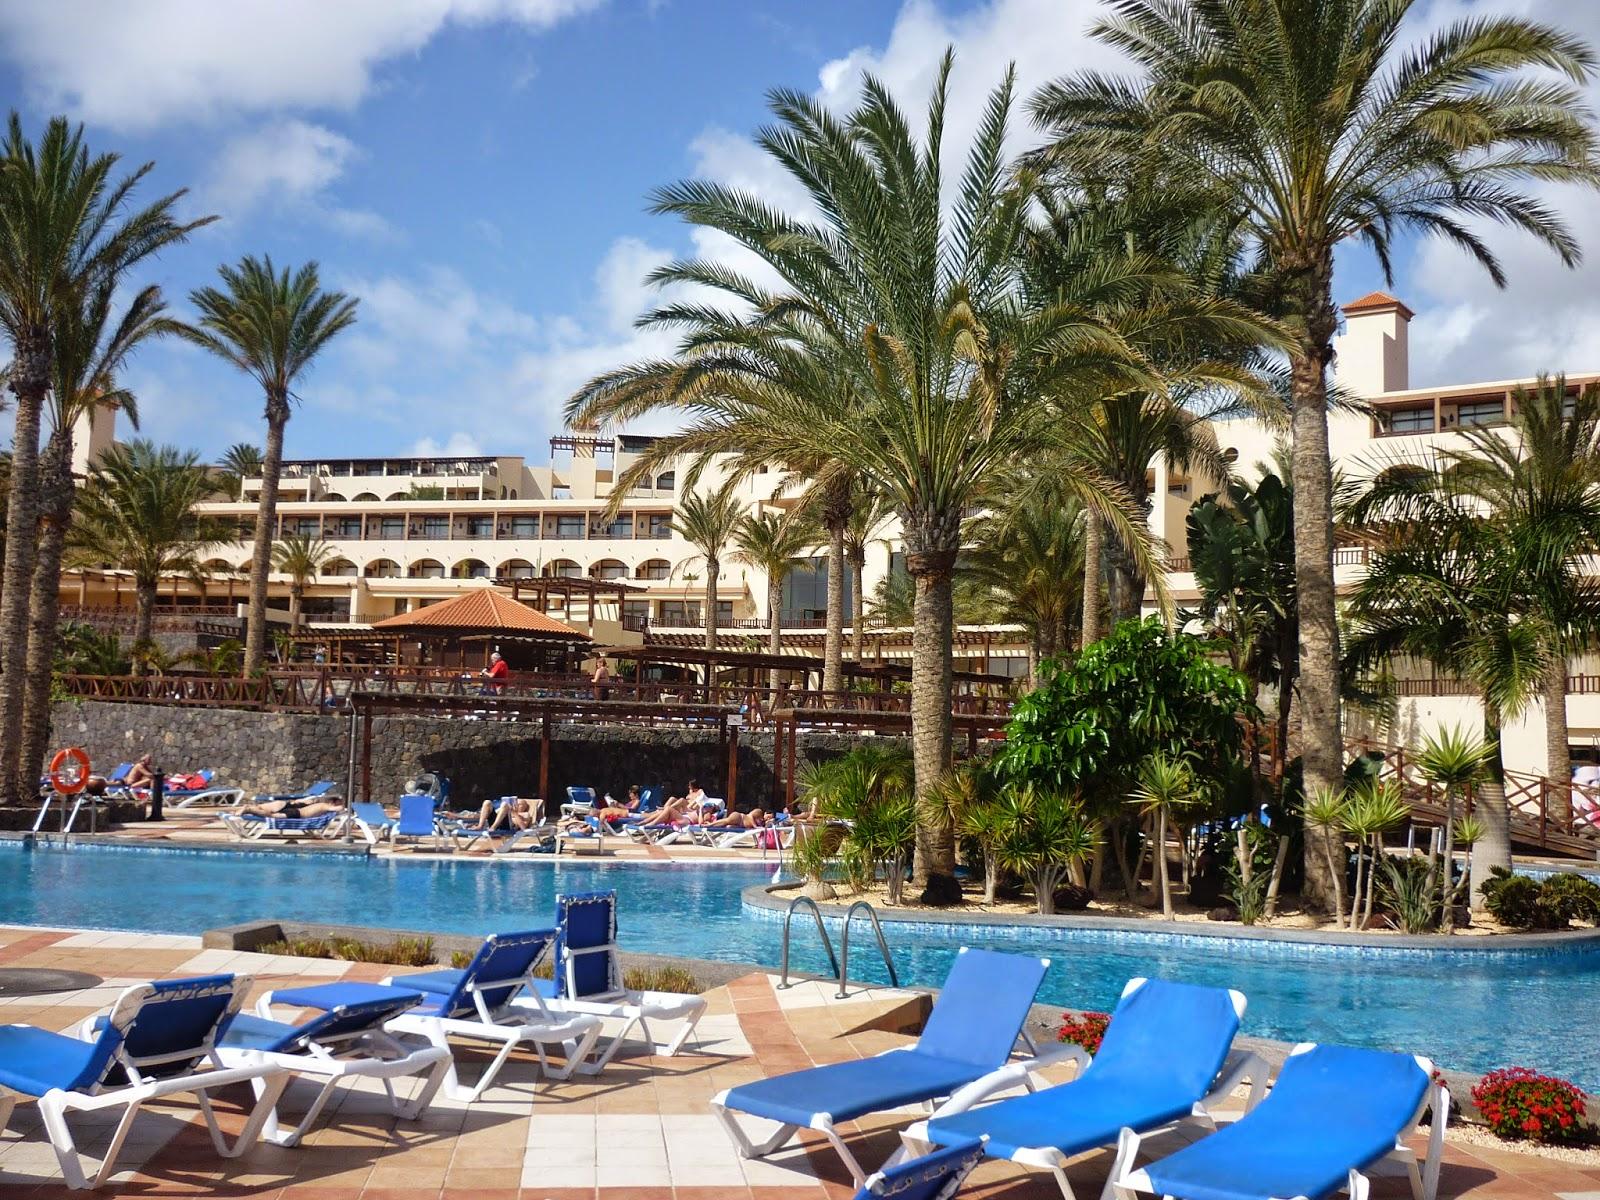 Fuerteventura - îles canaries - hotel barcelo jandia mar